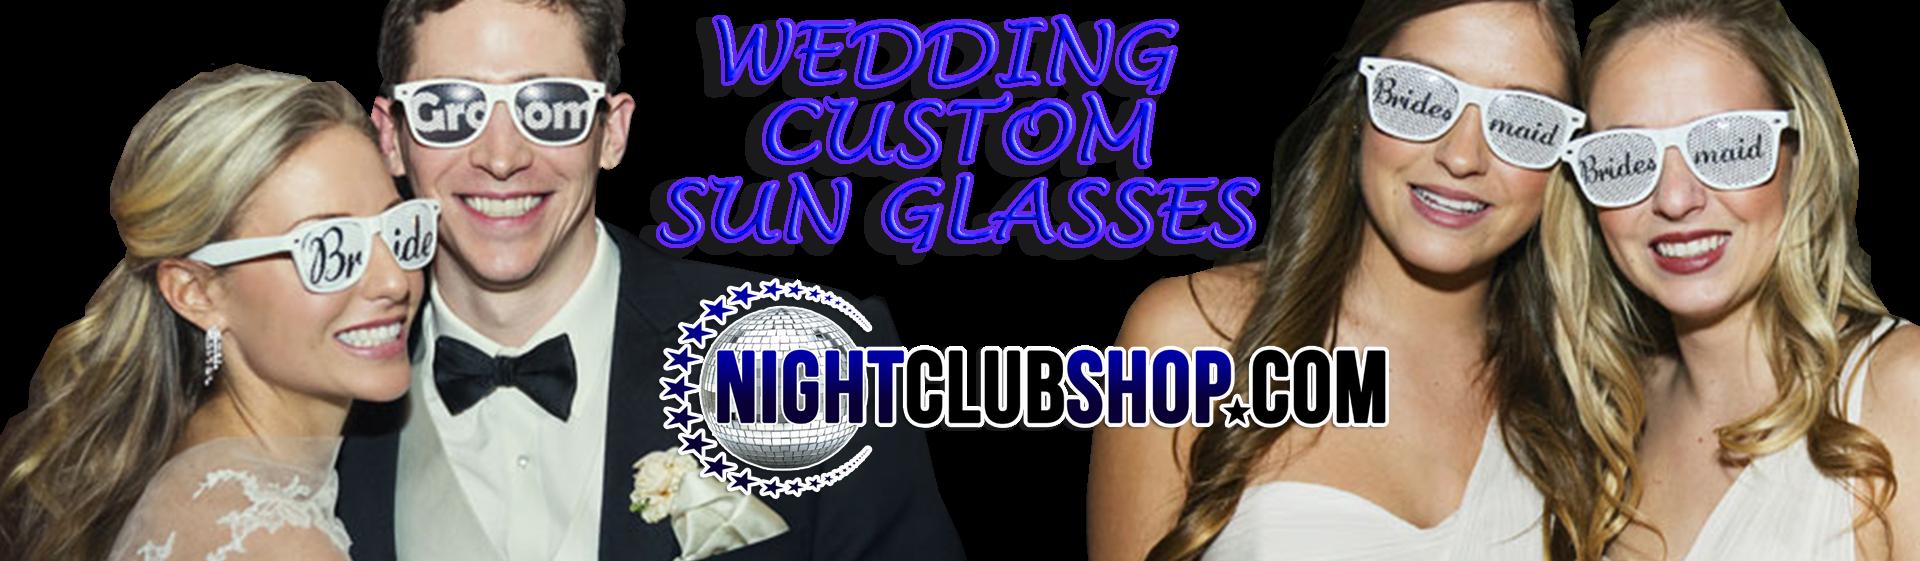 custom-print-wedding-sun-glasses-shades-lenses-sunglasses-billboard-bride-groom-party-favor-nightclubshop-bride-groom.png